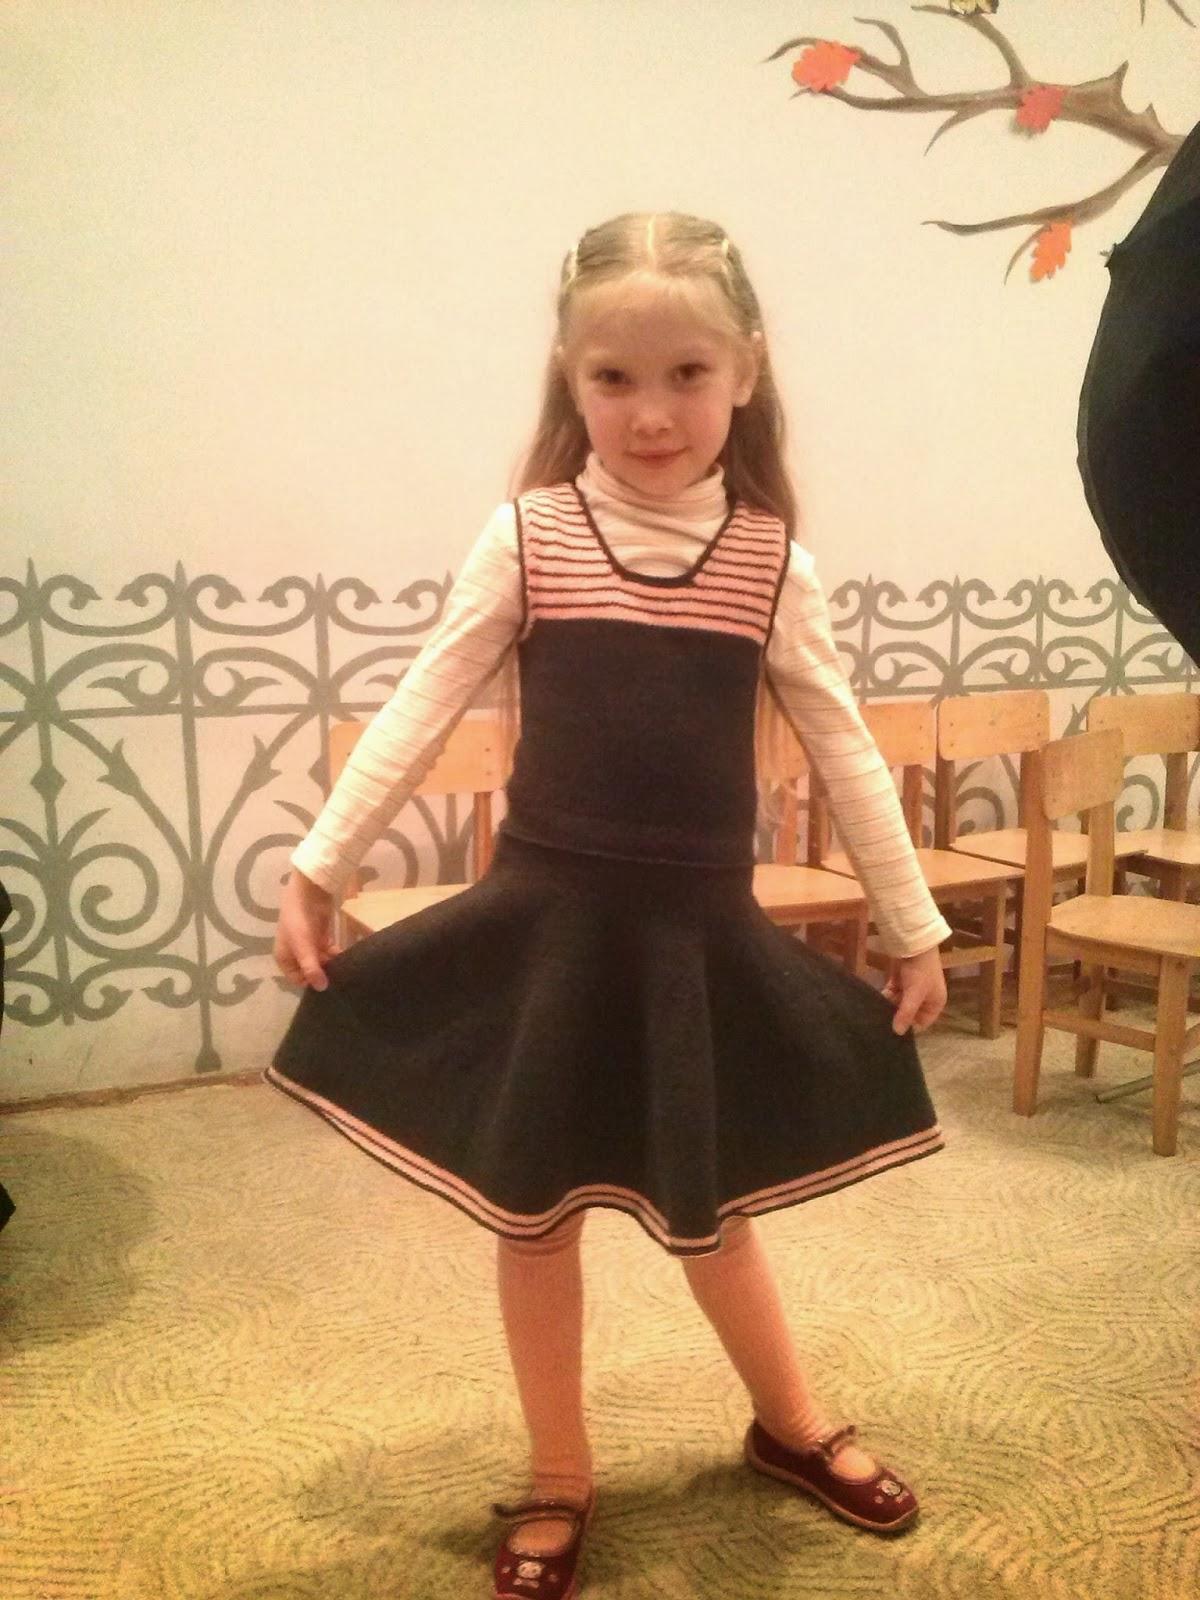 девочка подняла юбку: